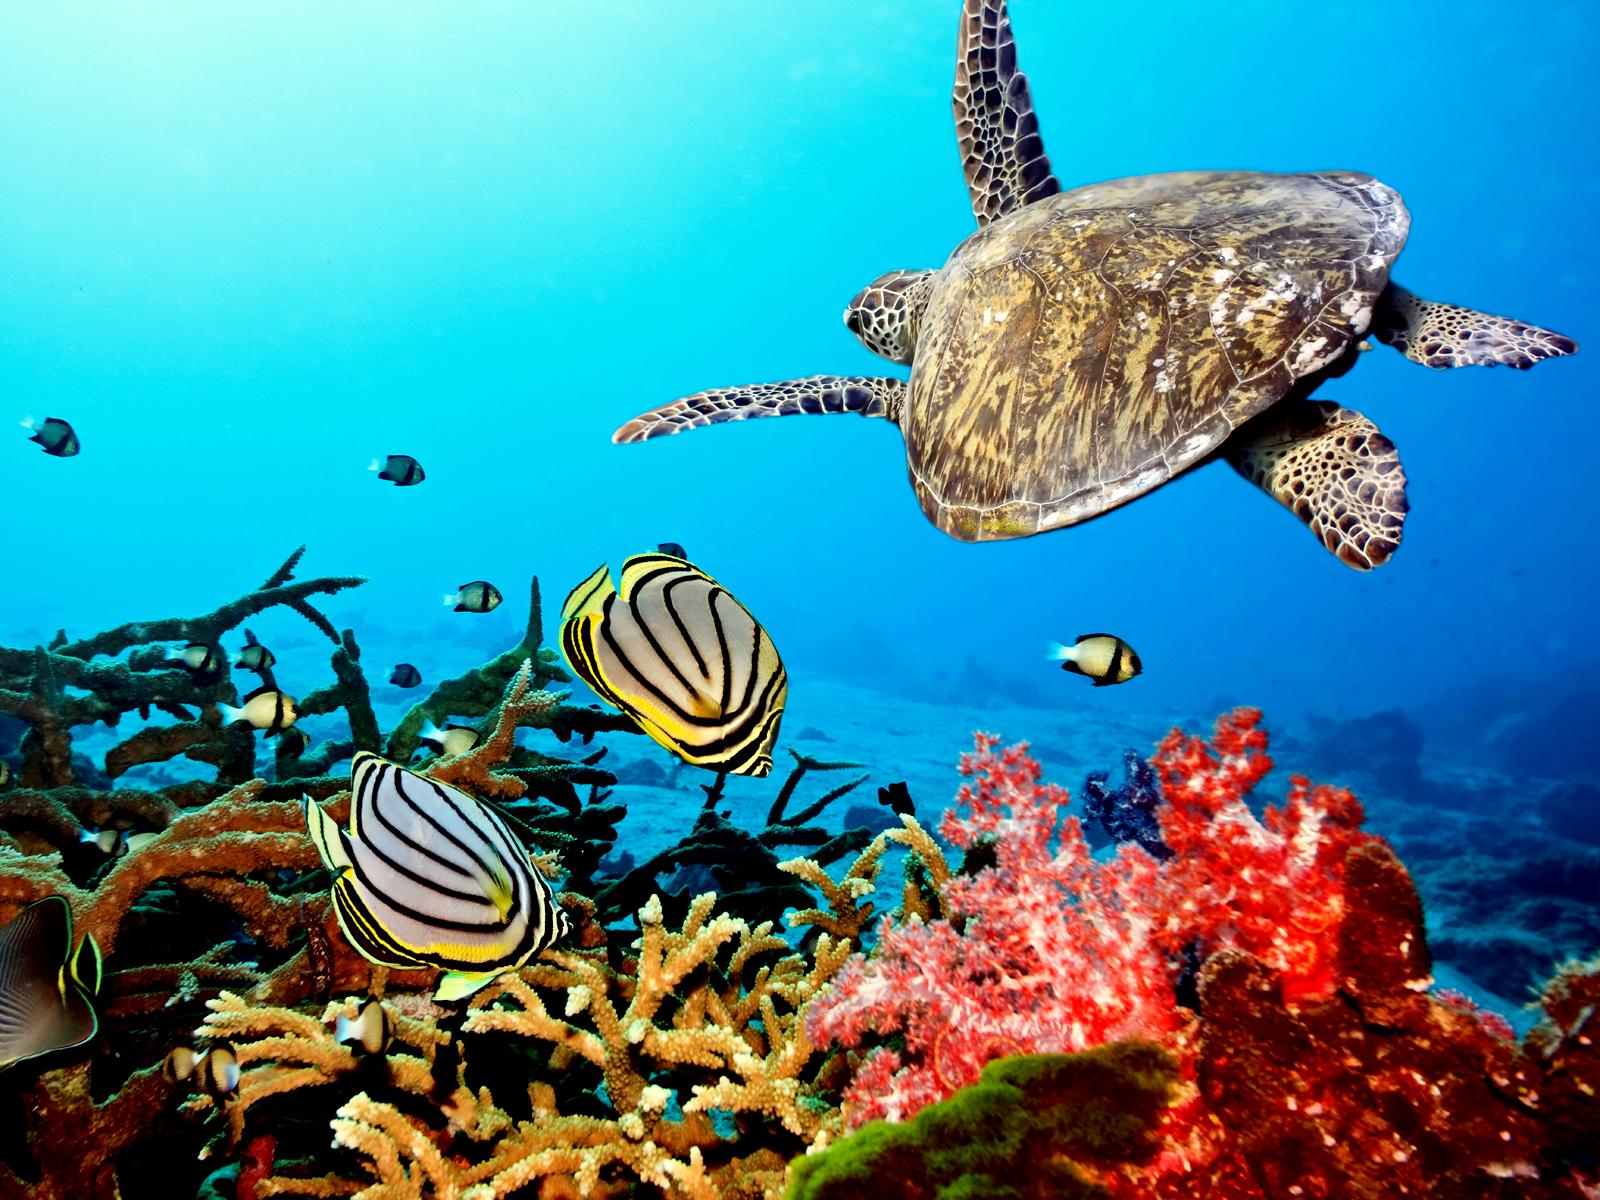 Sea Life Aquarium Wallpaper Photography Hd Desktop Wallpapers Sea Turtle Wallpaper Underwater Animals Animal Wallpaper